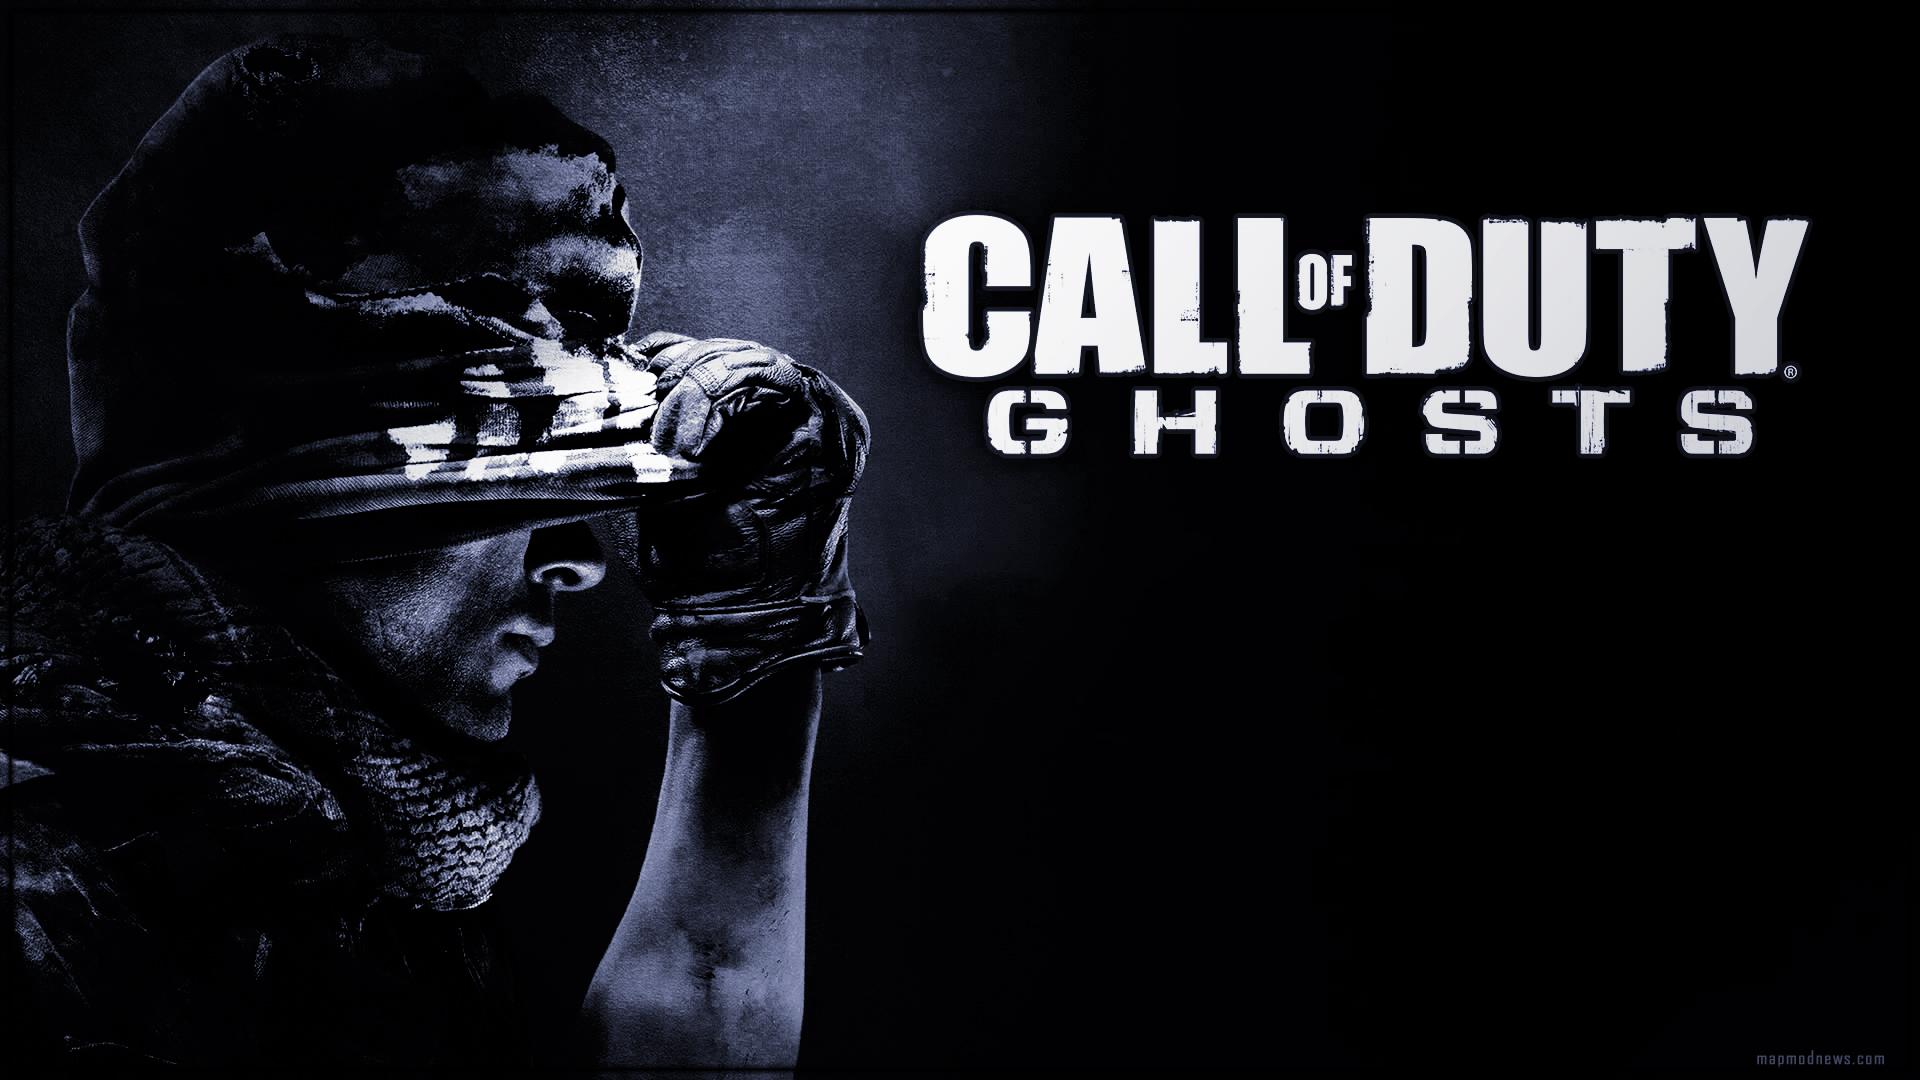 call_of_duty_ghosts-wallpaper-big1.jpg